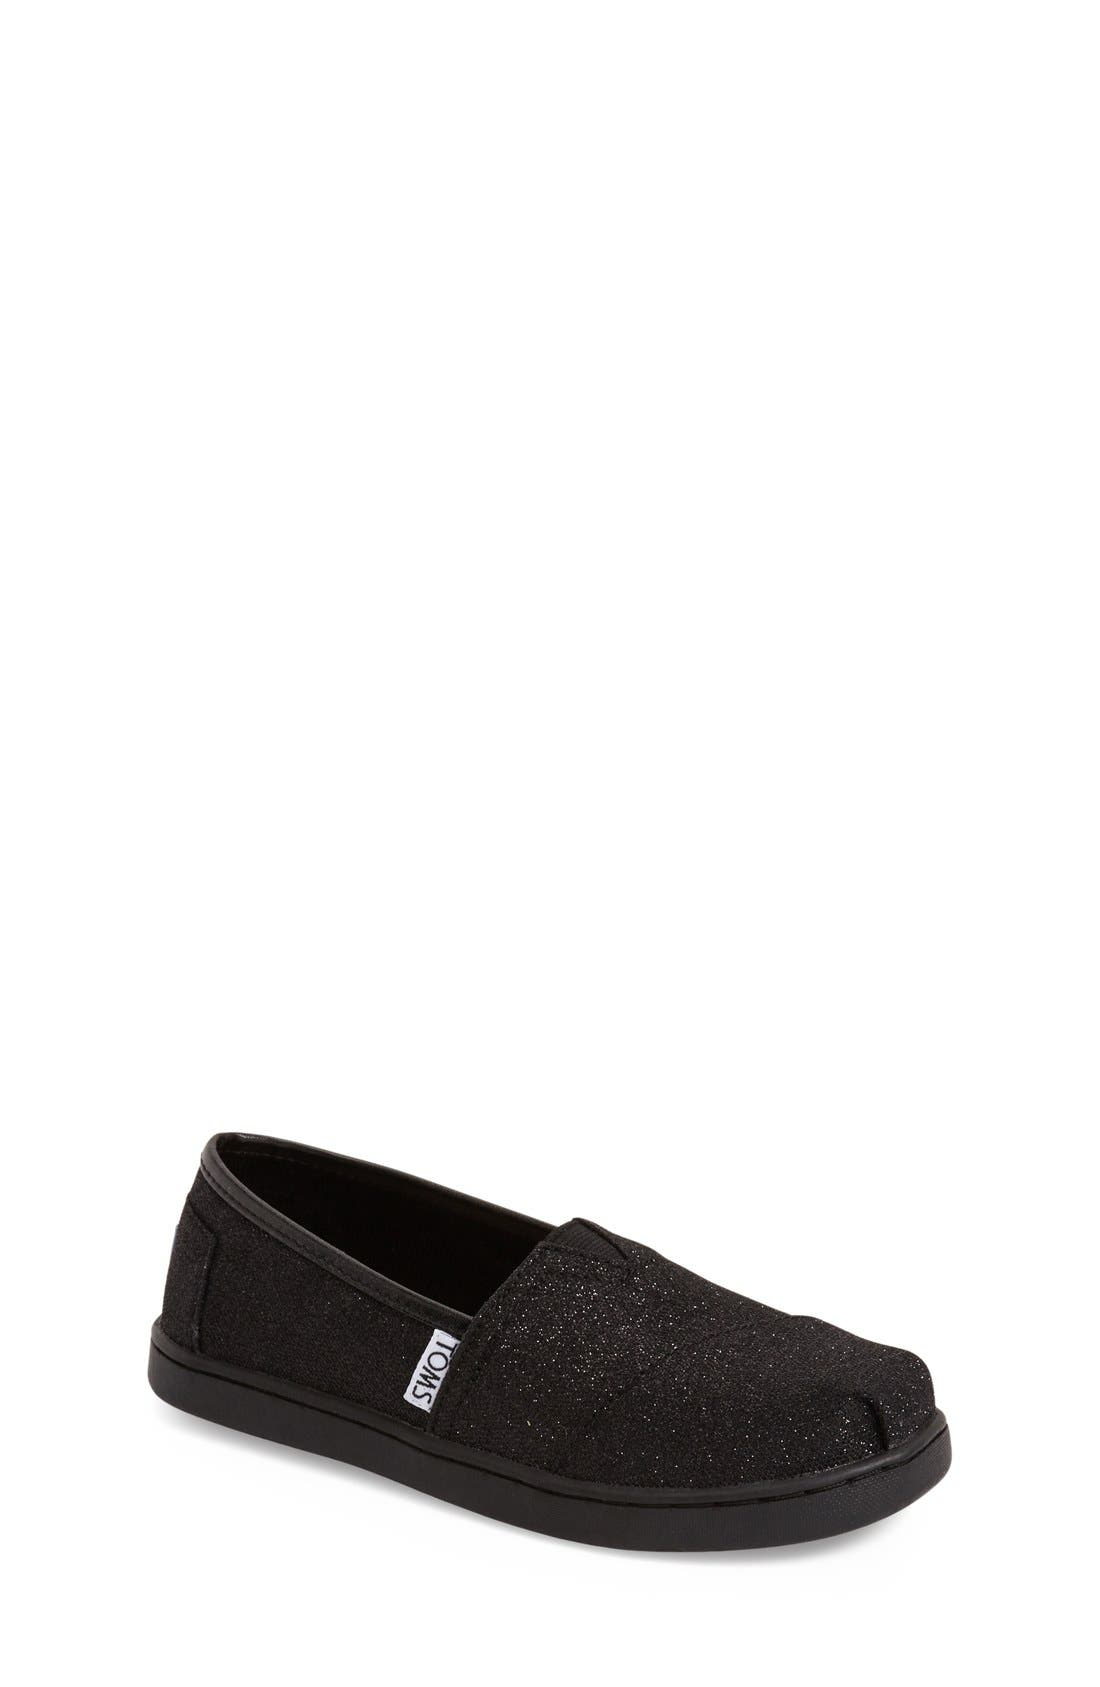 'Glimmer' Slip-On,                         Main,                         color, Black